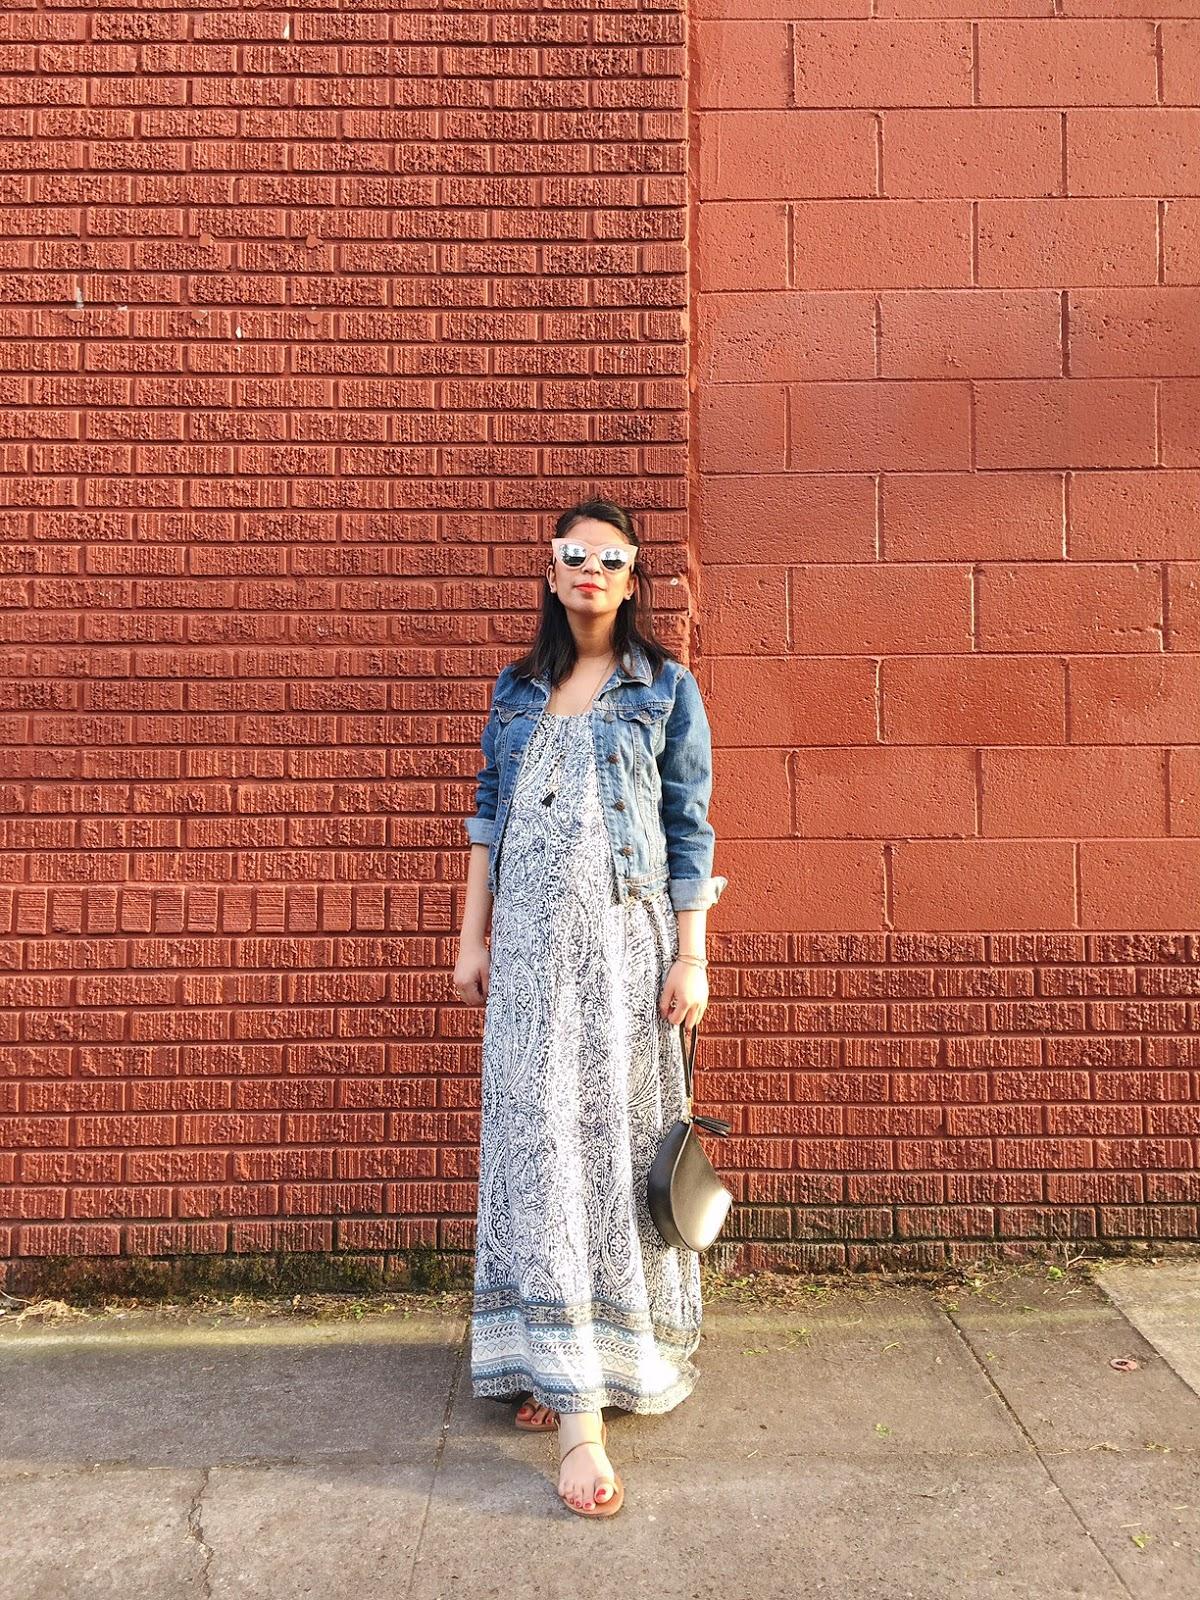 bodycon dresses, cocktail dresses, dresses, fblogger, maxi dresses, midi dresses, paisley dress, pdx fashion, portland fashion blogger, prom dresses, spring 2016,